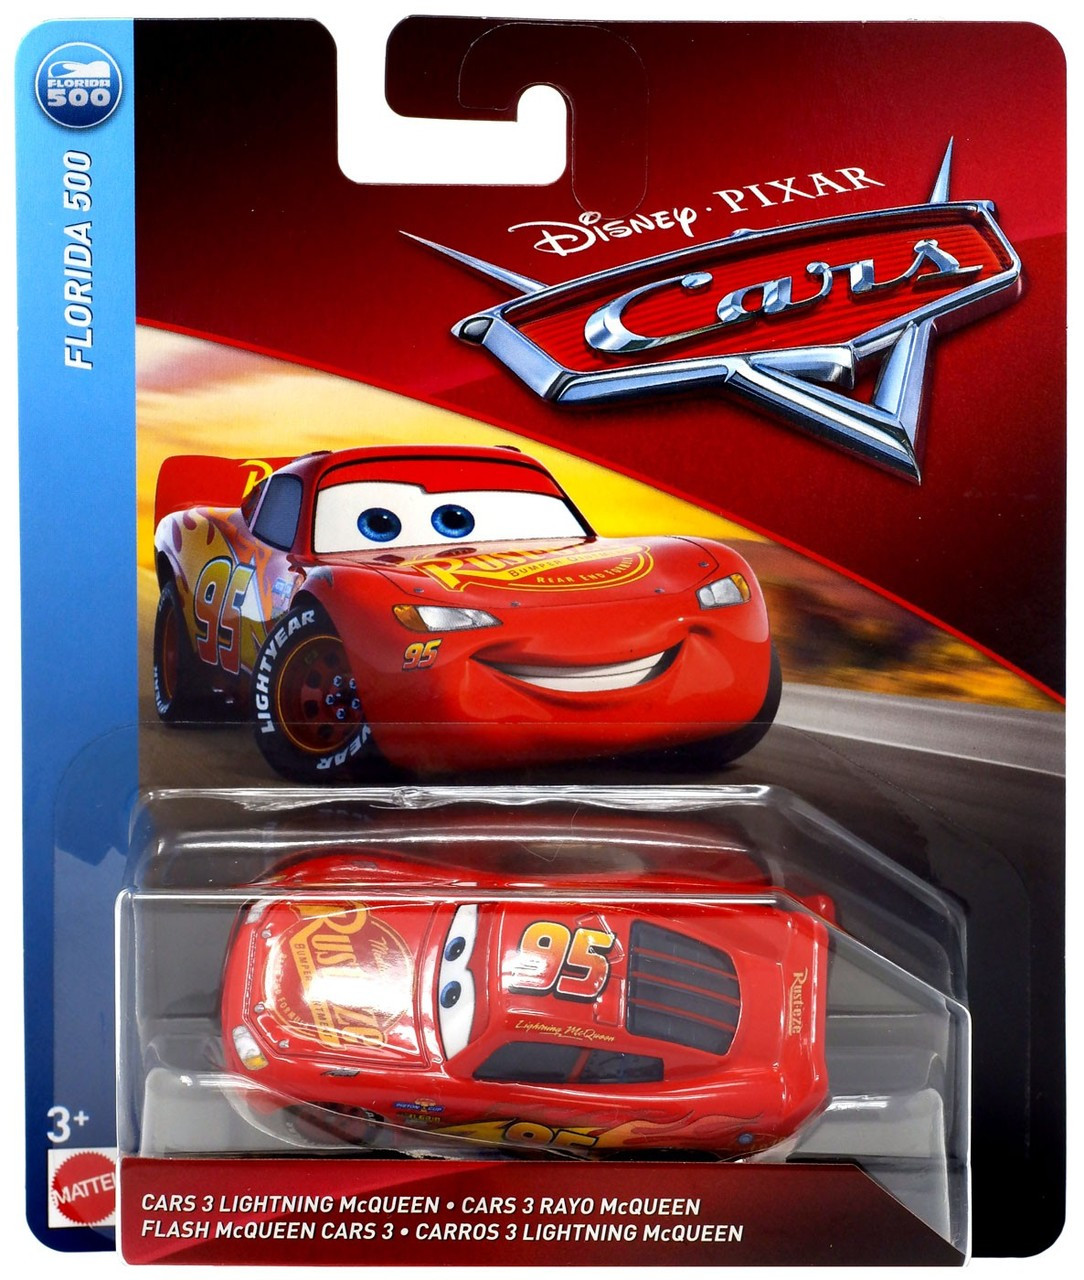 Disney Pixar Cars Cars 3 Florida 500 Cars 3 Lightning Mcqueen 155